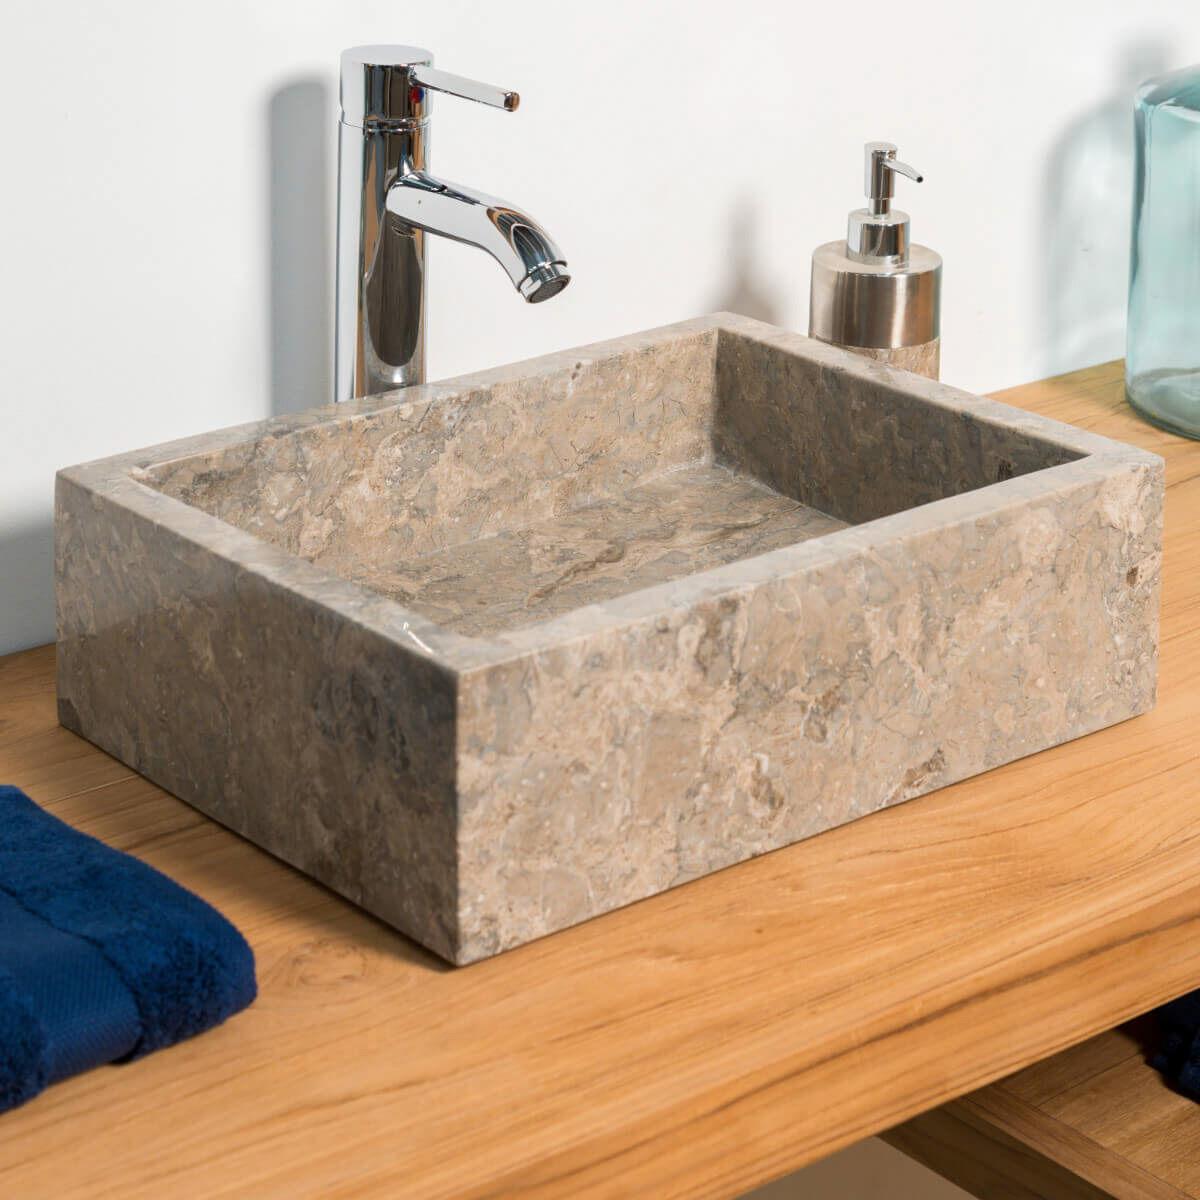 Wanda Collection Vasque salle de bain à poser MILAN rectangle 30cm x 40cm gris taupe